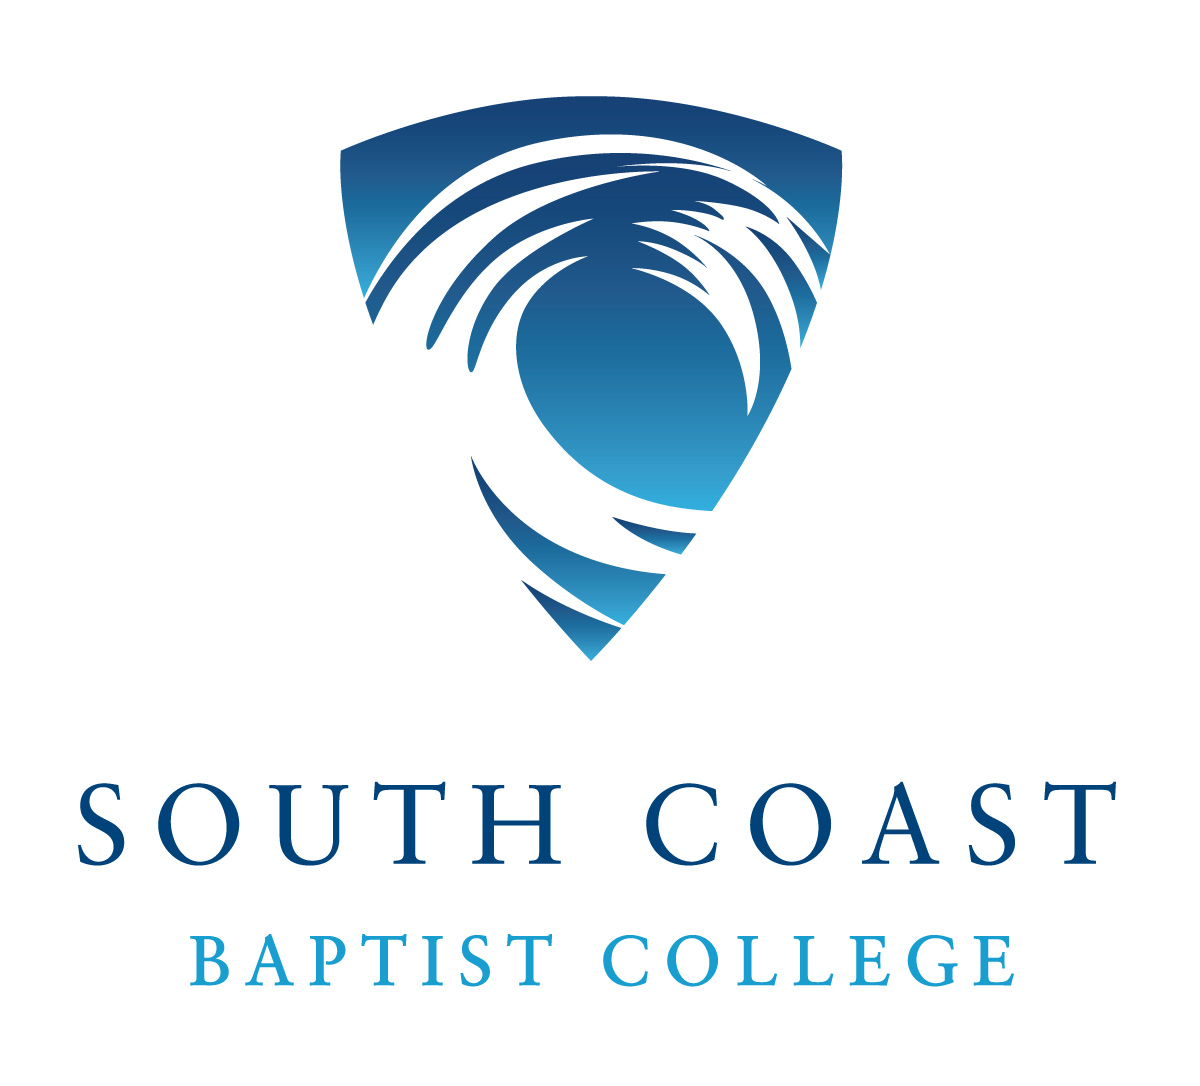 South Coast Baptist College